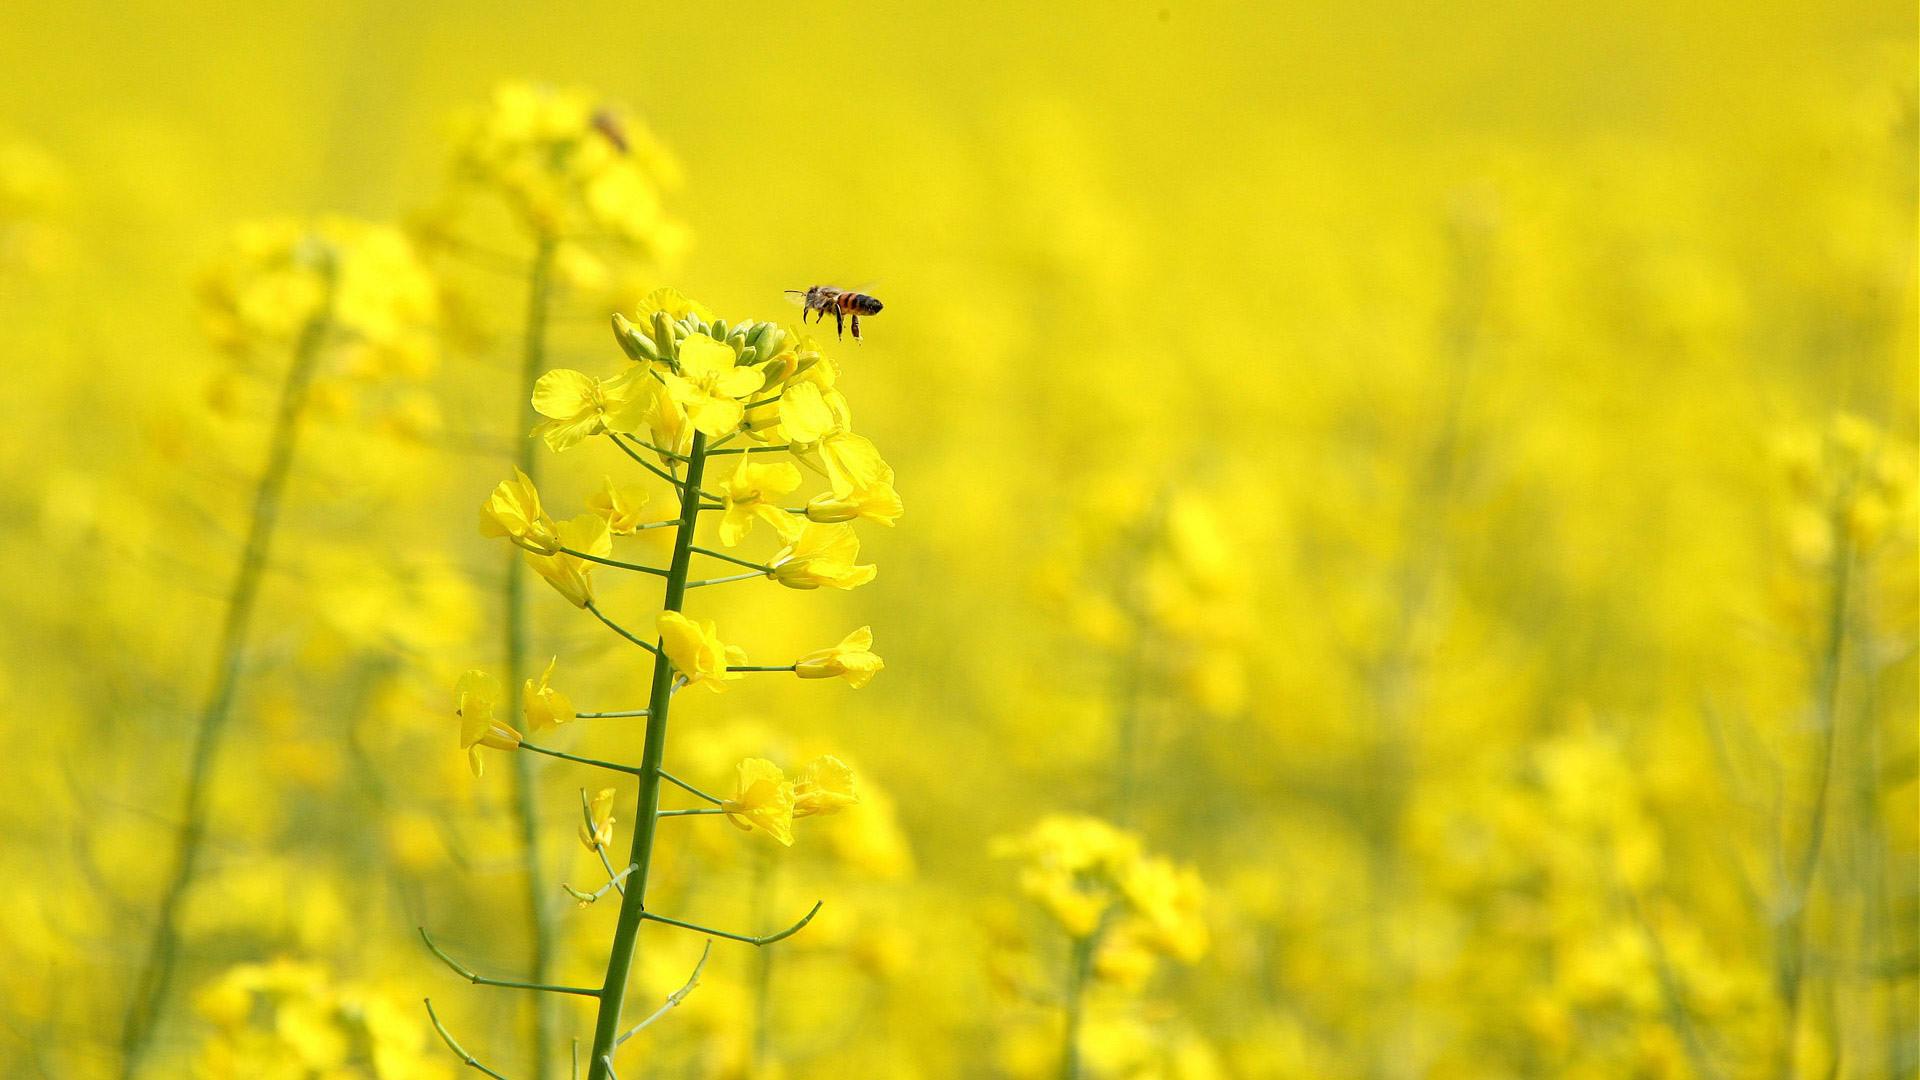 2628x1951 Yellow Flower Wallpaper HD